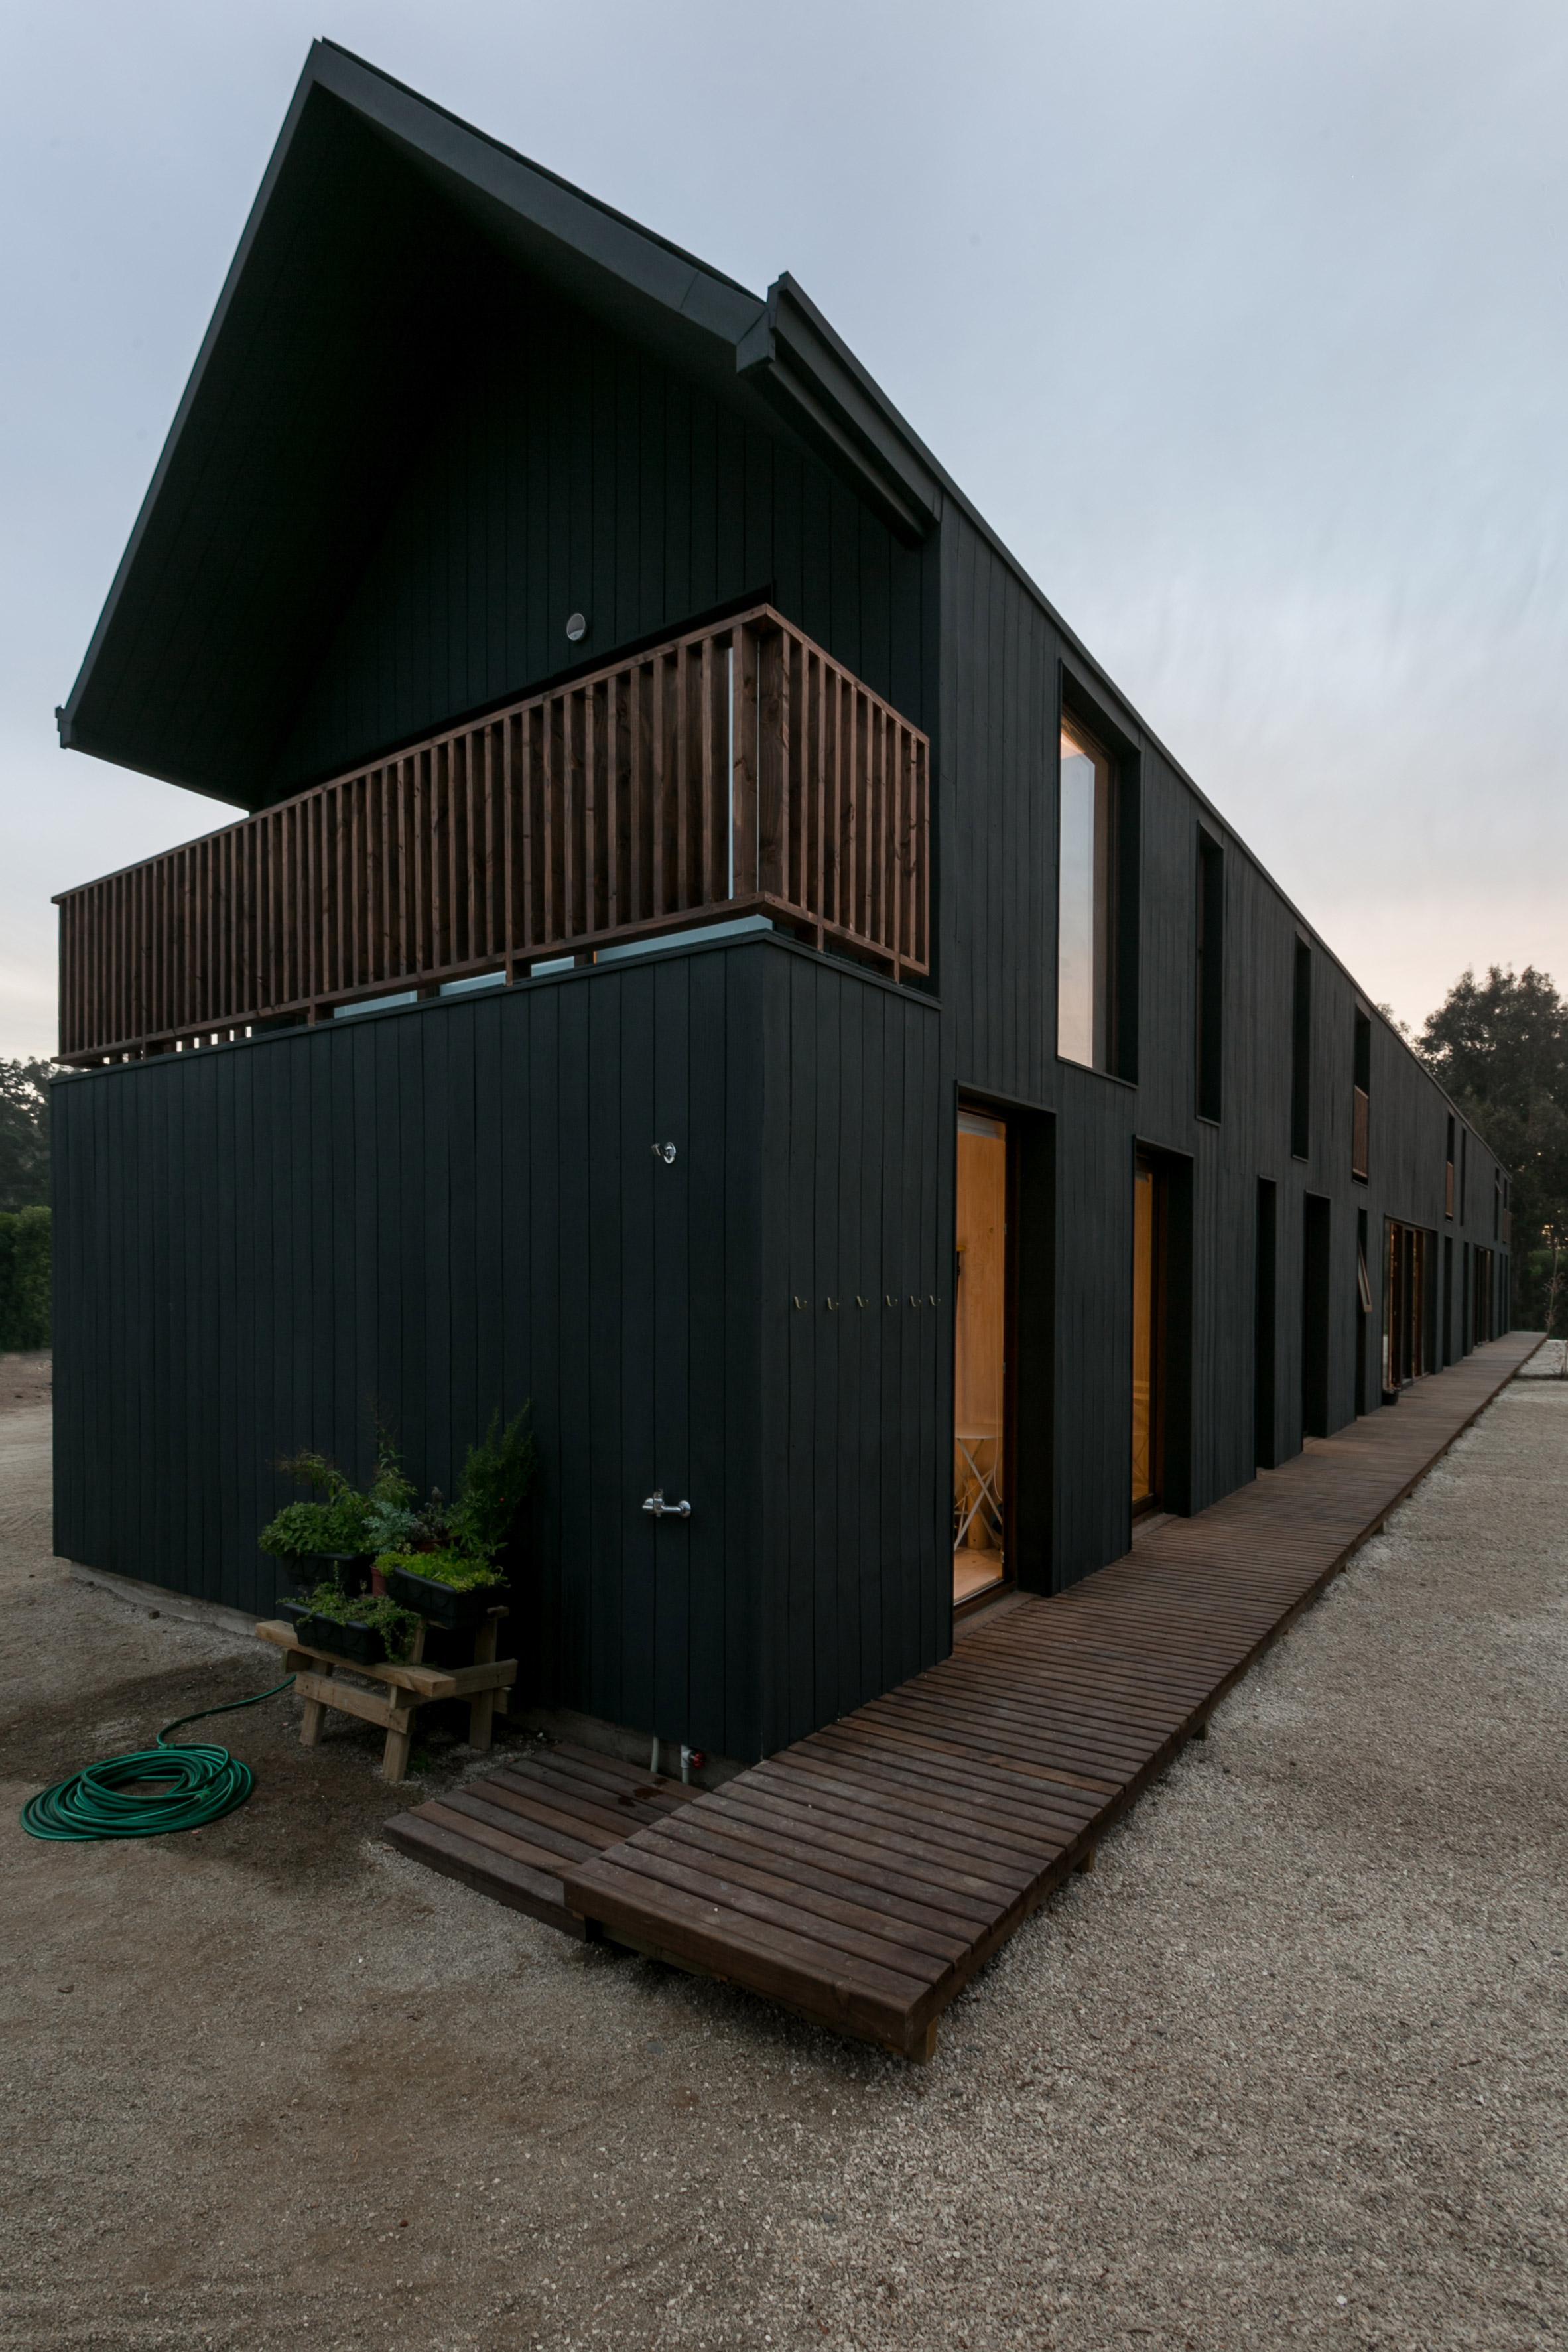 shotgun-house-alejandro-soffia-architecture-black-wood-chile_dezeen_2364_col_15.jpg